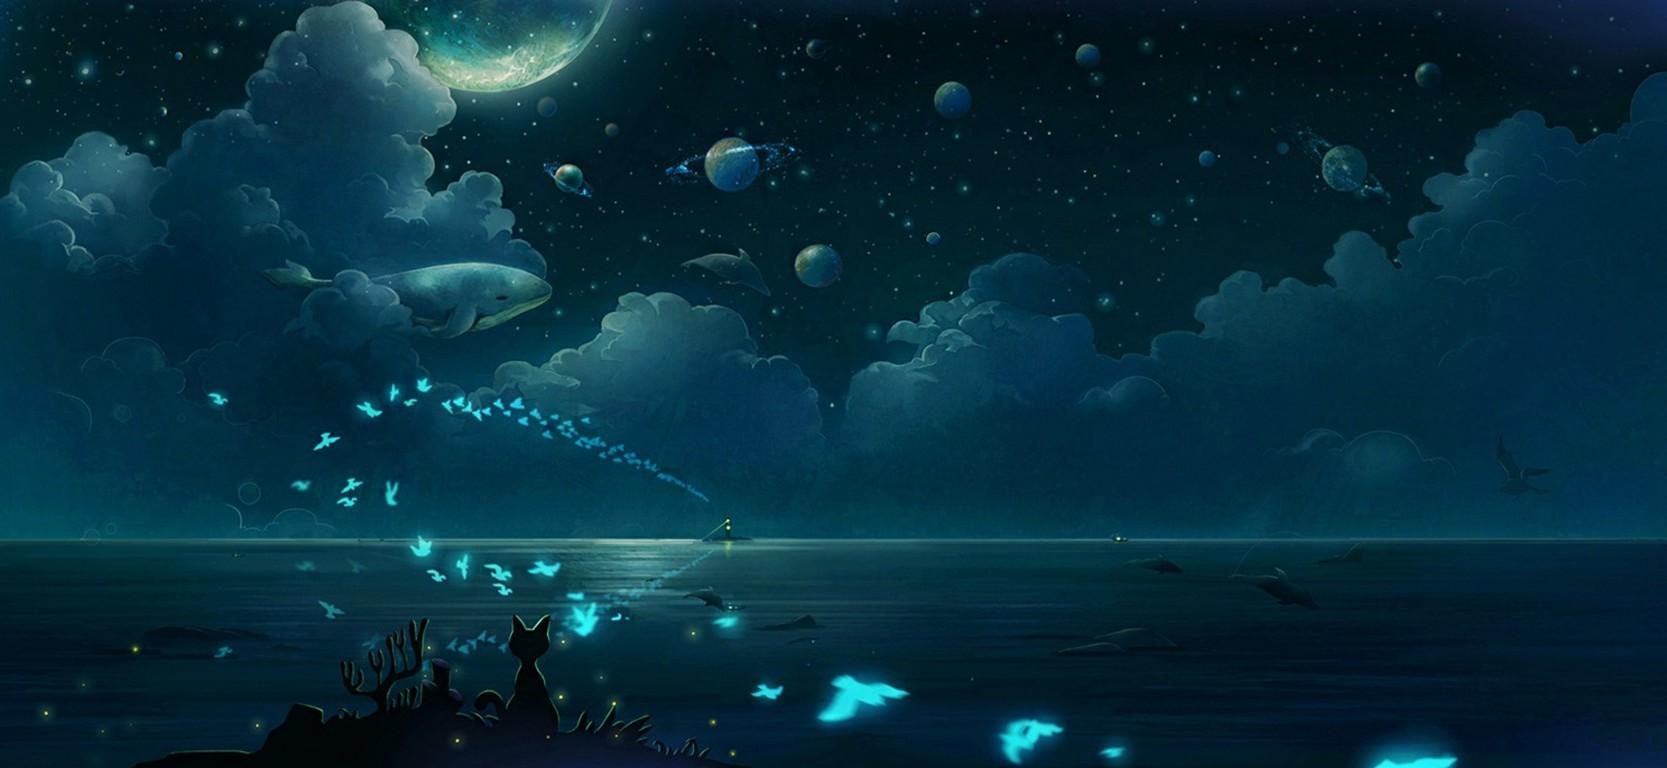 Popular Wallpaper Cat Butterfly - cat-birds-animals-night-planet-clouds-fish-butterfly-underwater-moonlight-whale-ocean-screenshot-computer-wallpaper-outer-space-marine-biology-1667x768-px-519688  Pictures_569312 .jpg